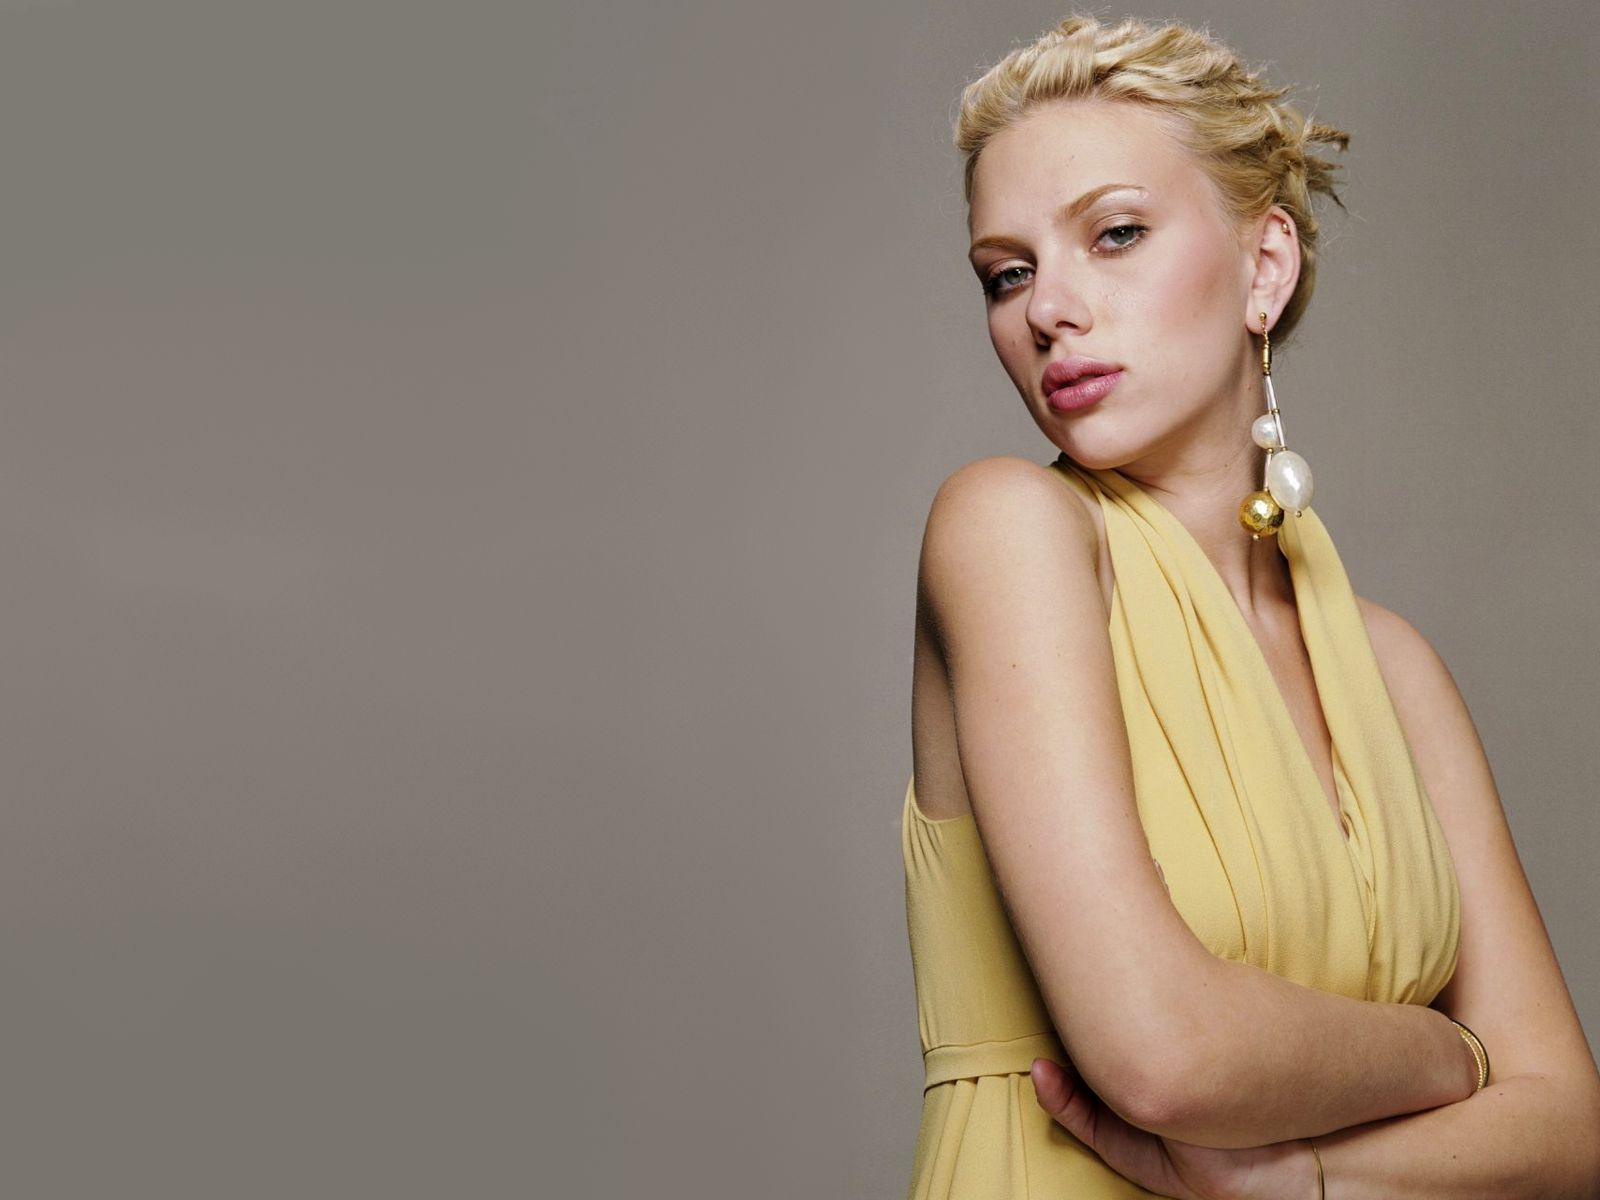 Hot Bio Celebrity Pictures: Scarlett Johansson Latest Hot ...